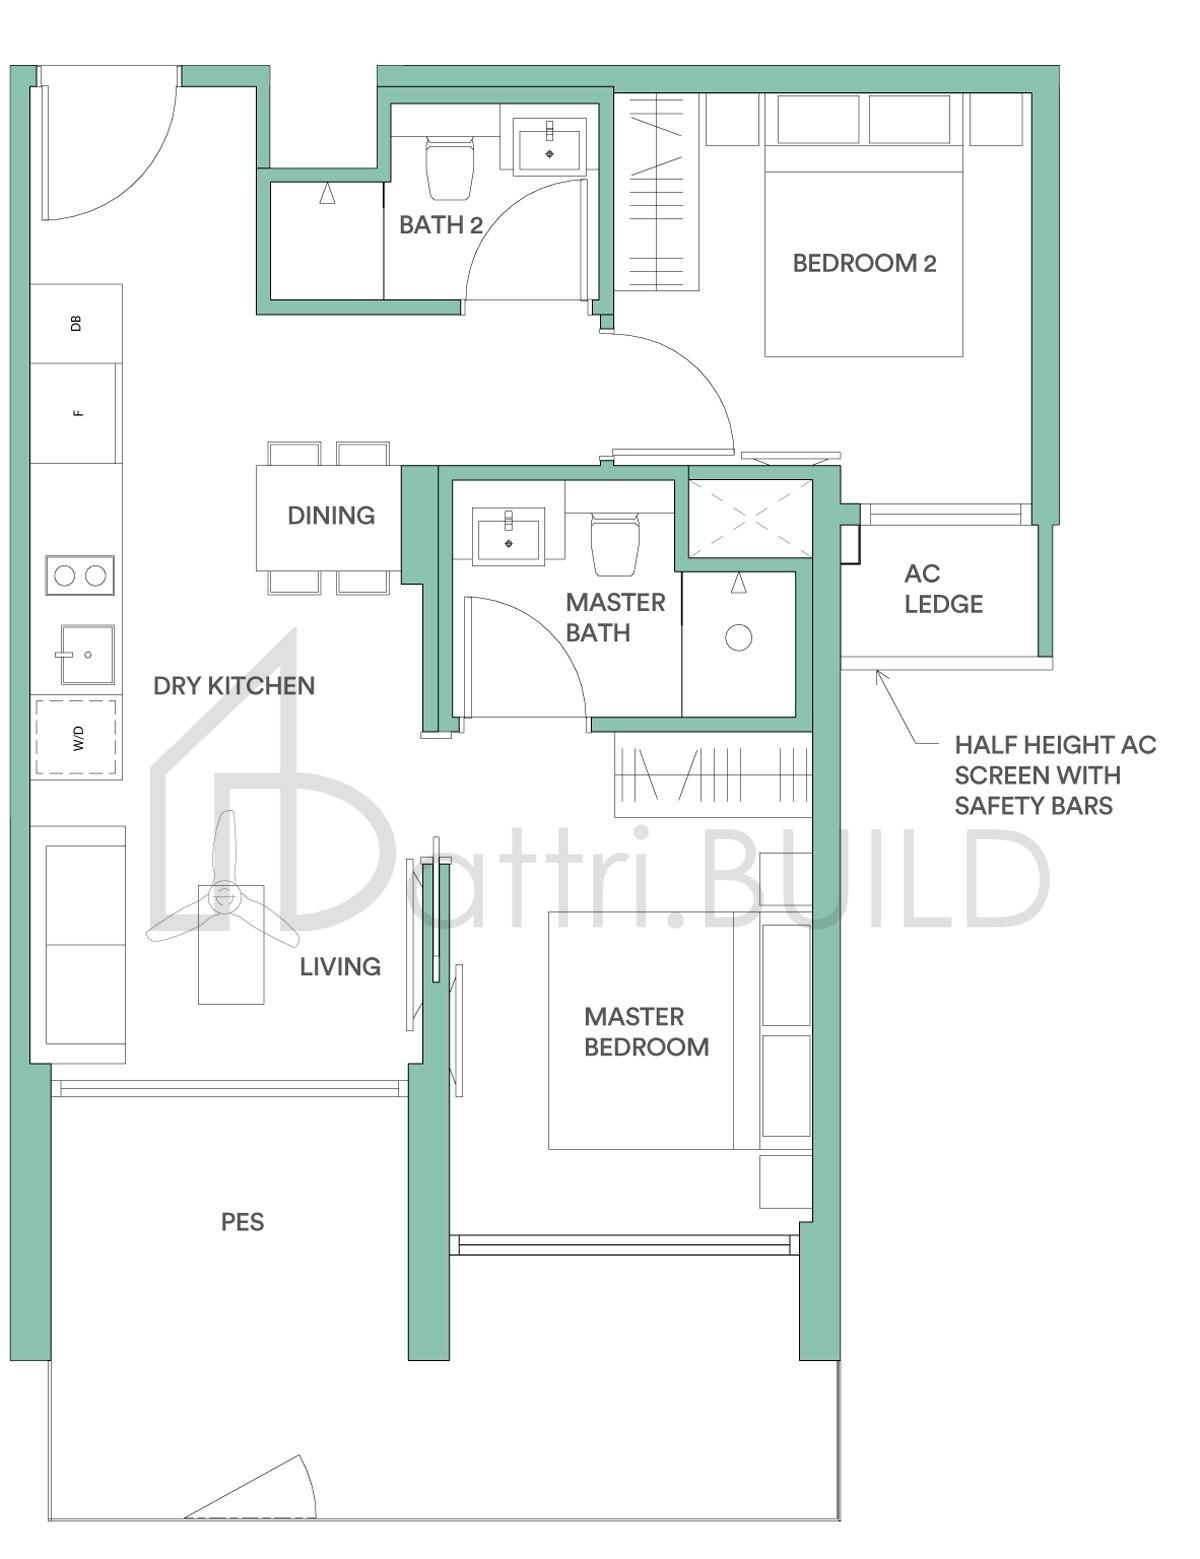 Park Place Residences At Plq 2 Bedroom Type C2pb